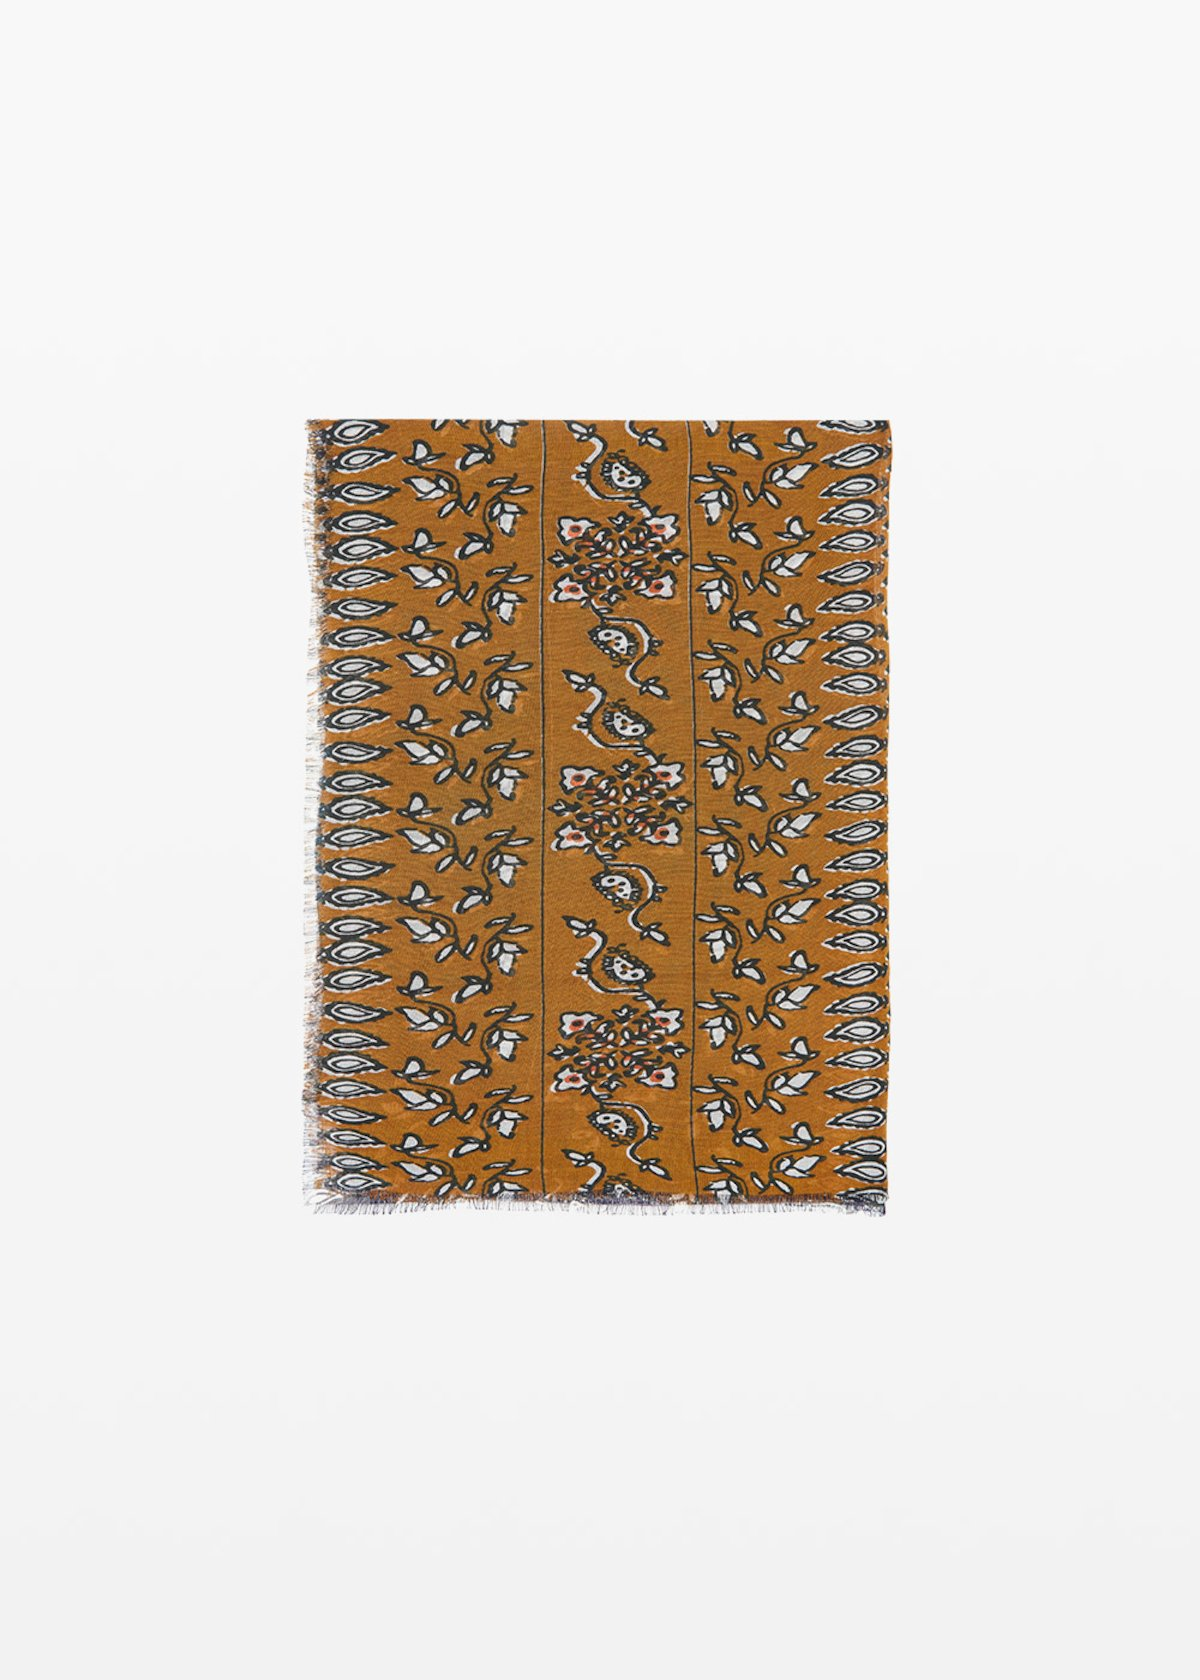 Sciarpa Saphir cachemire printed - Medium Blue Fantasia - Donna - Immagine categoria